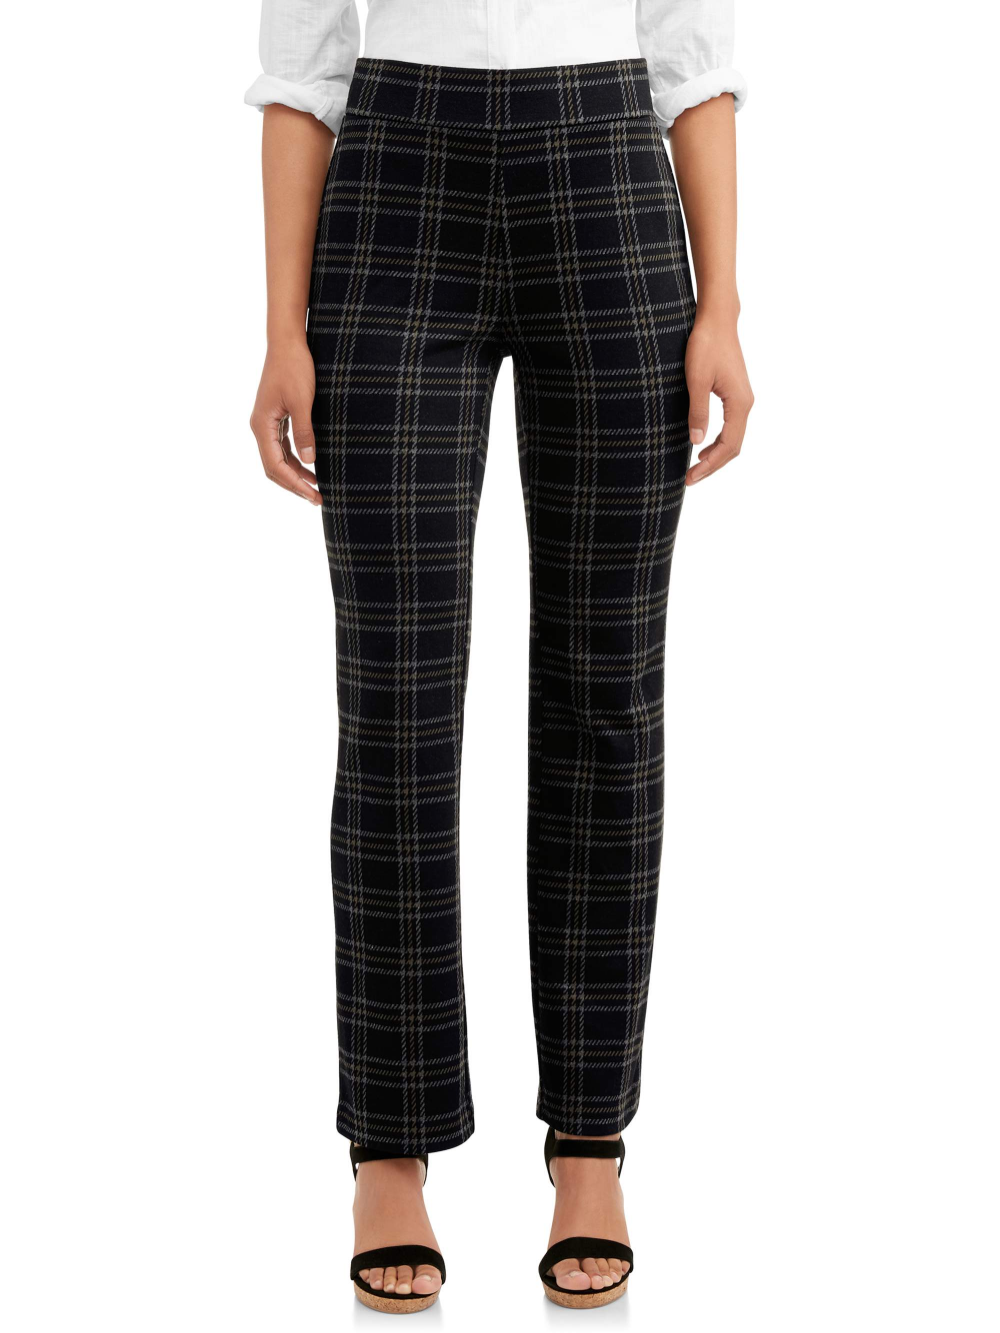 Time And Tru Time And Tru Women S Knit Bootcut Pant Walmart Com In 2021 Pants For Women Bootcut Pants Work Pants Women [ 1333 x 1000 Pixel ]